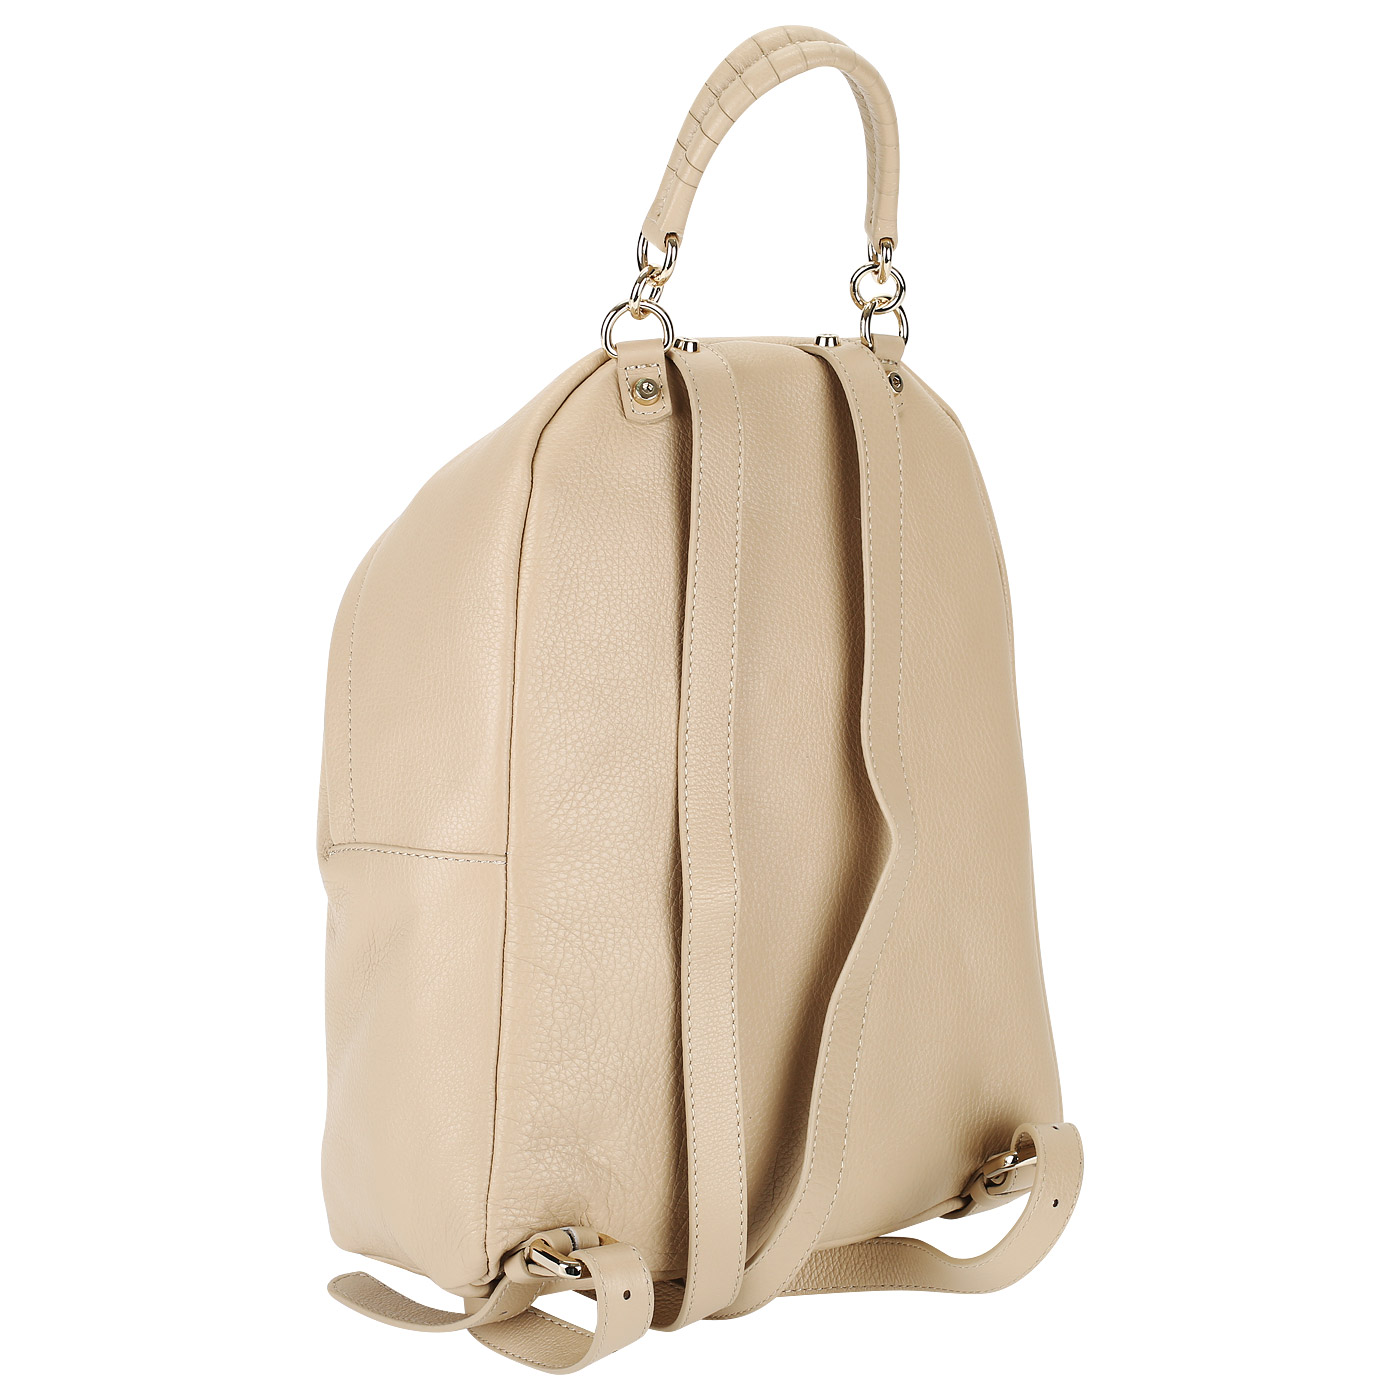 747da61f32ac Женский кожаный рюкзак с регулируемыми лямками Coccinelle Leonie BN0 ...